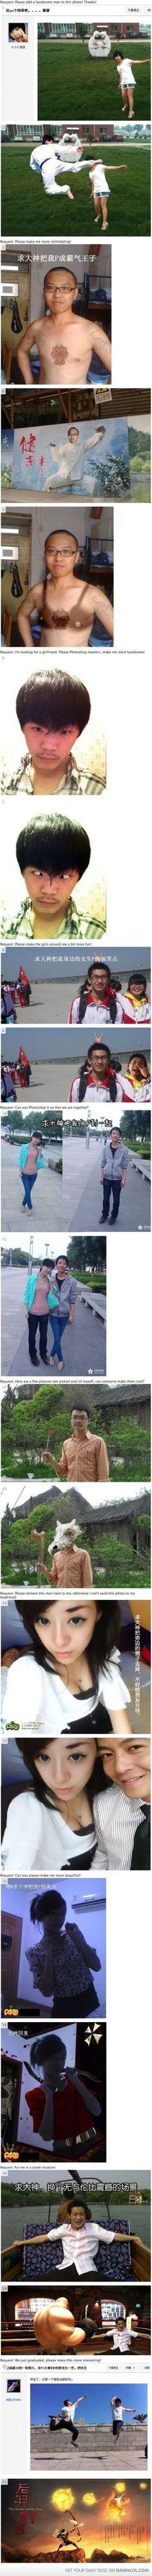 Epic Asian Photoshop Troll